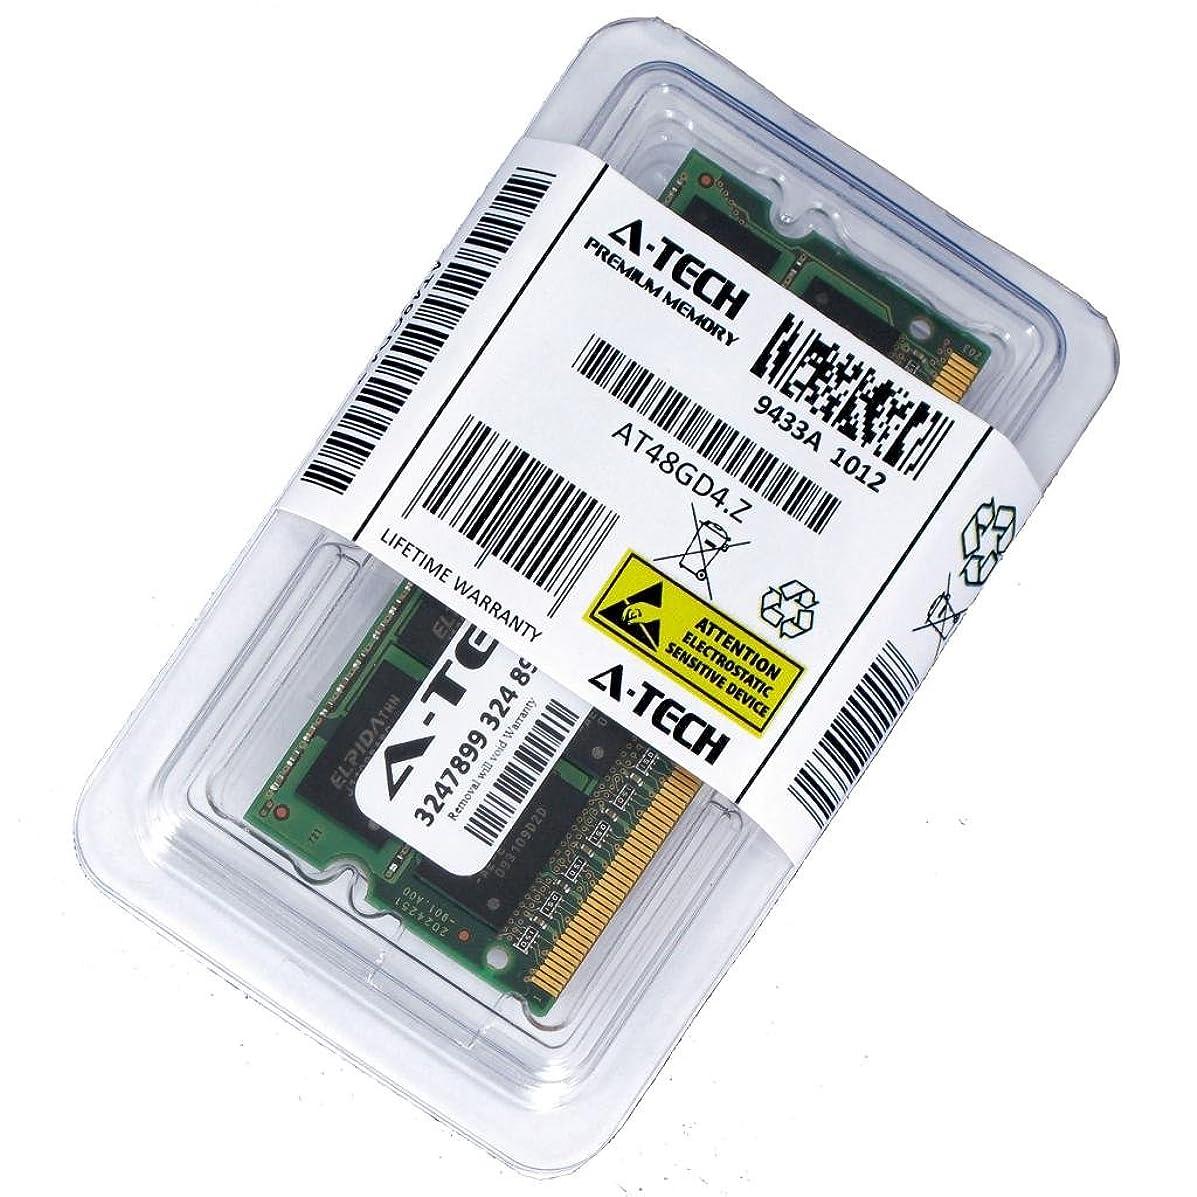 4GB Stick for ASUS ASmobile Notebook U24A U32VJ U47A U47VC VivoBook R550CM X Ultrabook. SO-DIMM DDR3 Non-ECC PC3-12800 1600MHz RAM Memory. Genuine A-Tech Brand.